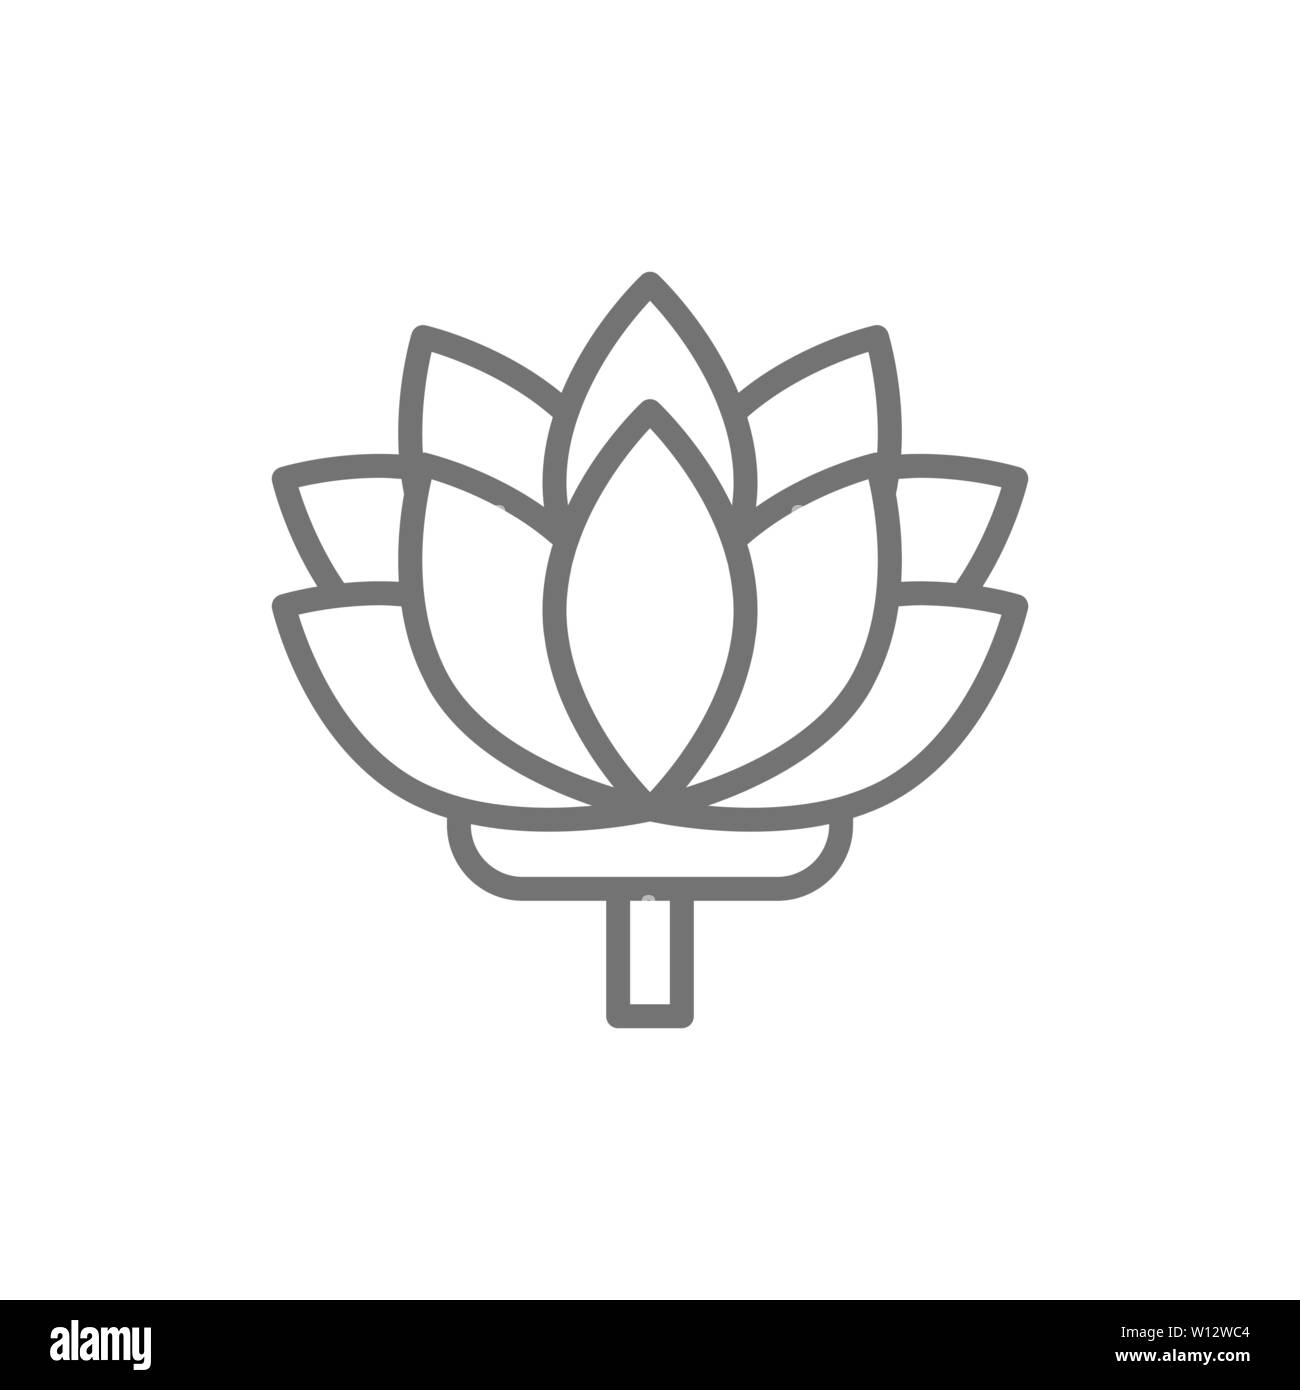 Lotus, indian flower line icon. Isolated on white background - Stock Image